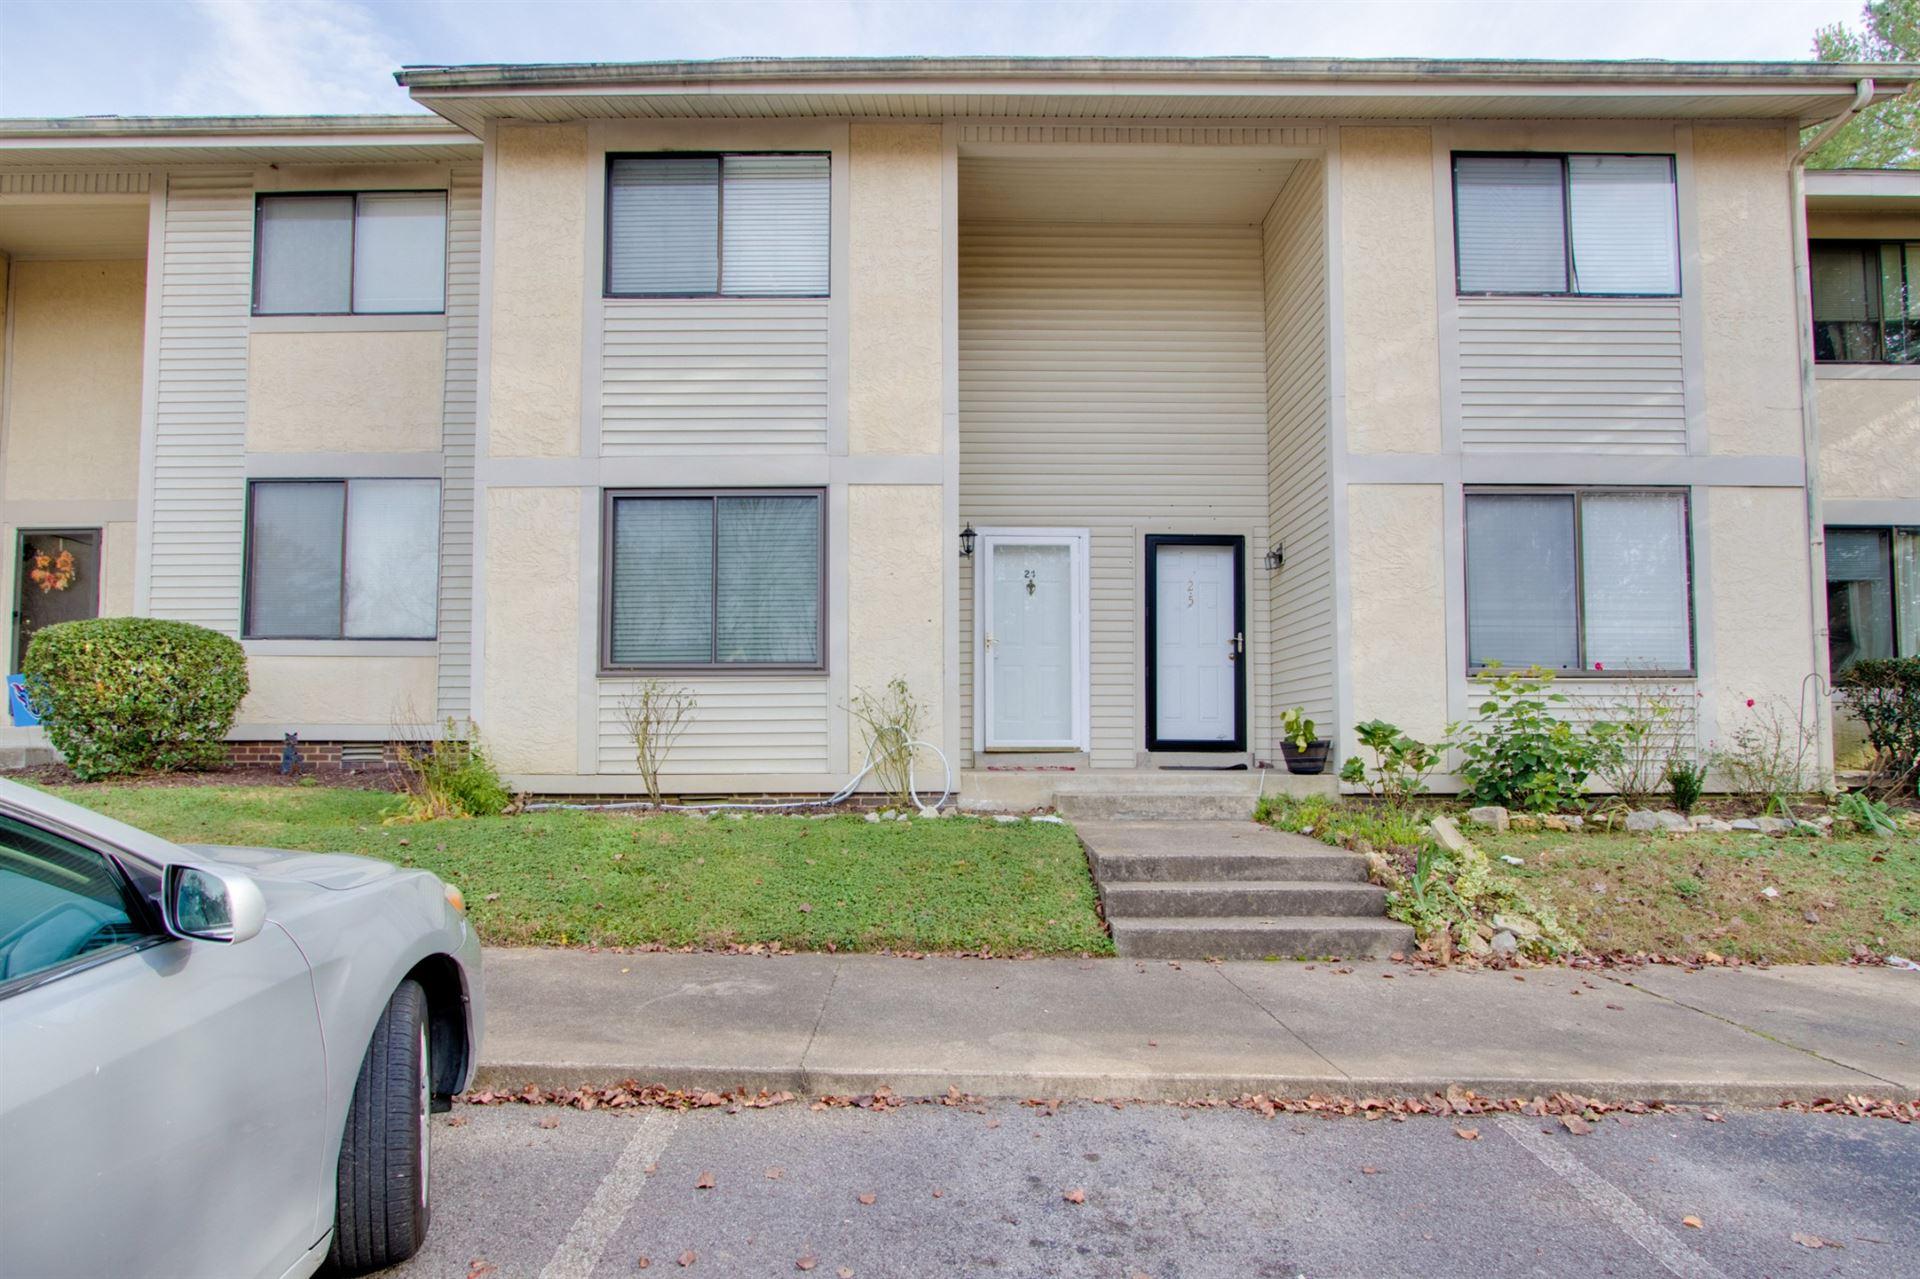 4958 Edmondson Pike #24, Nashville, TN 37211 - MLS#: 2211570